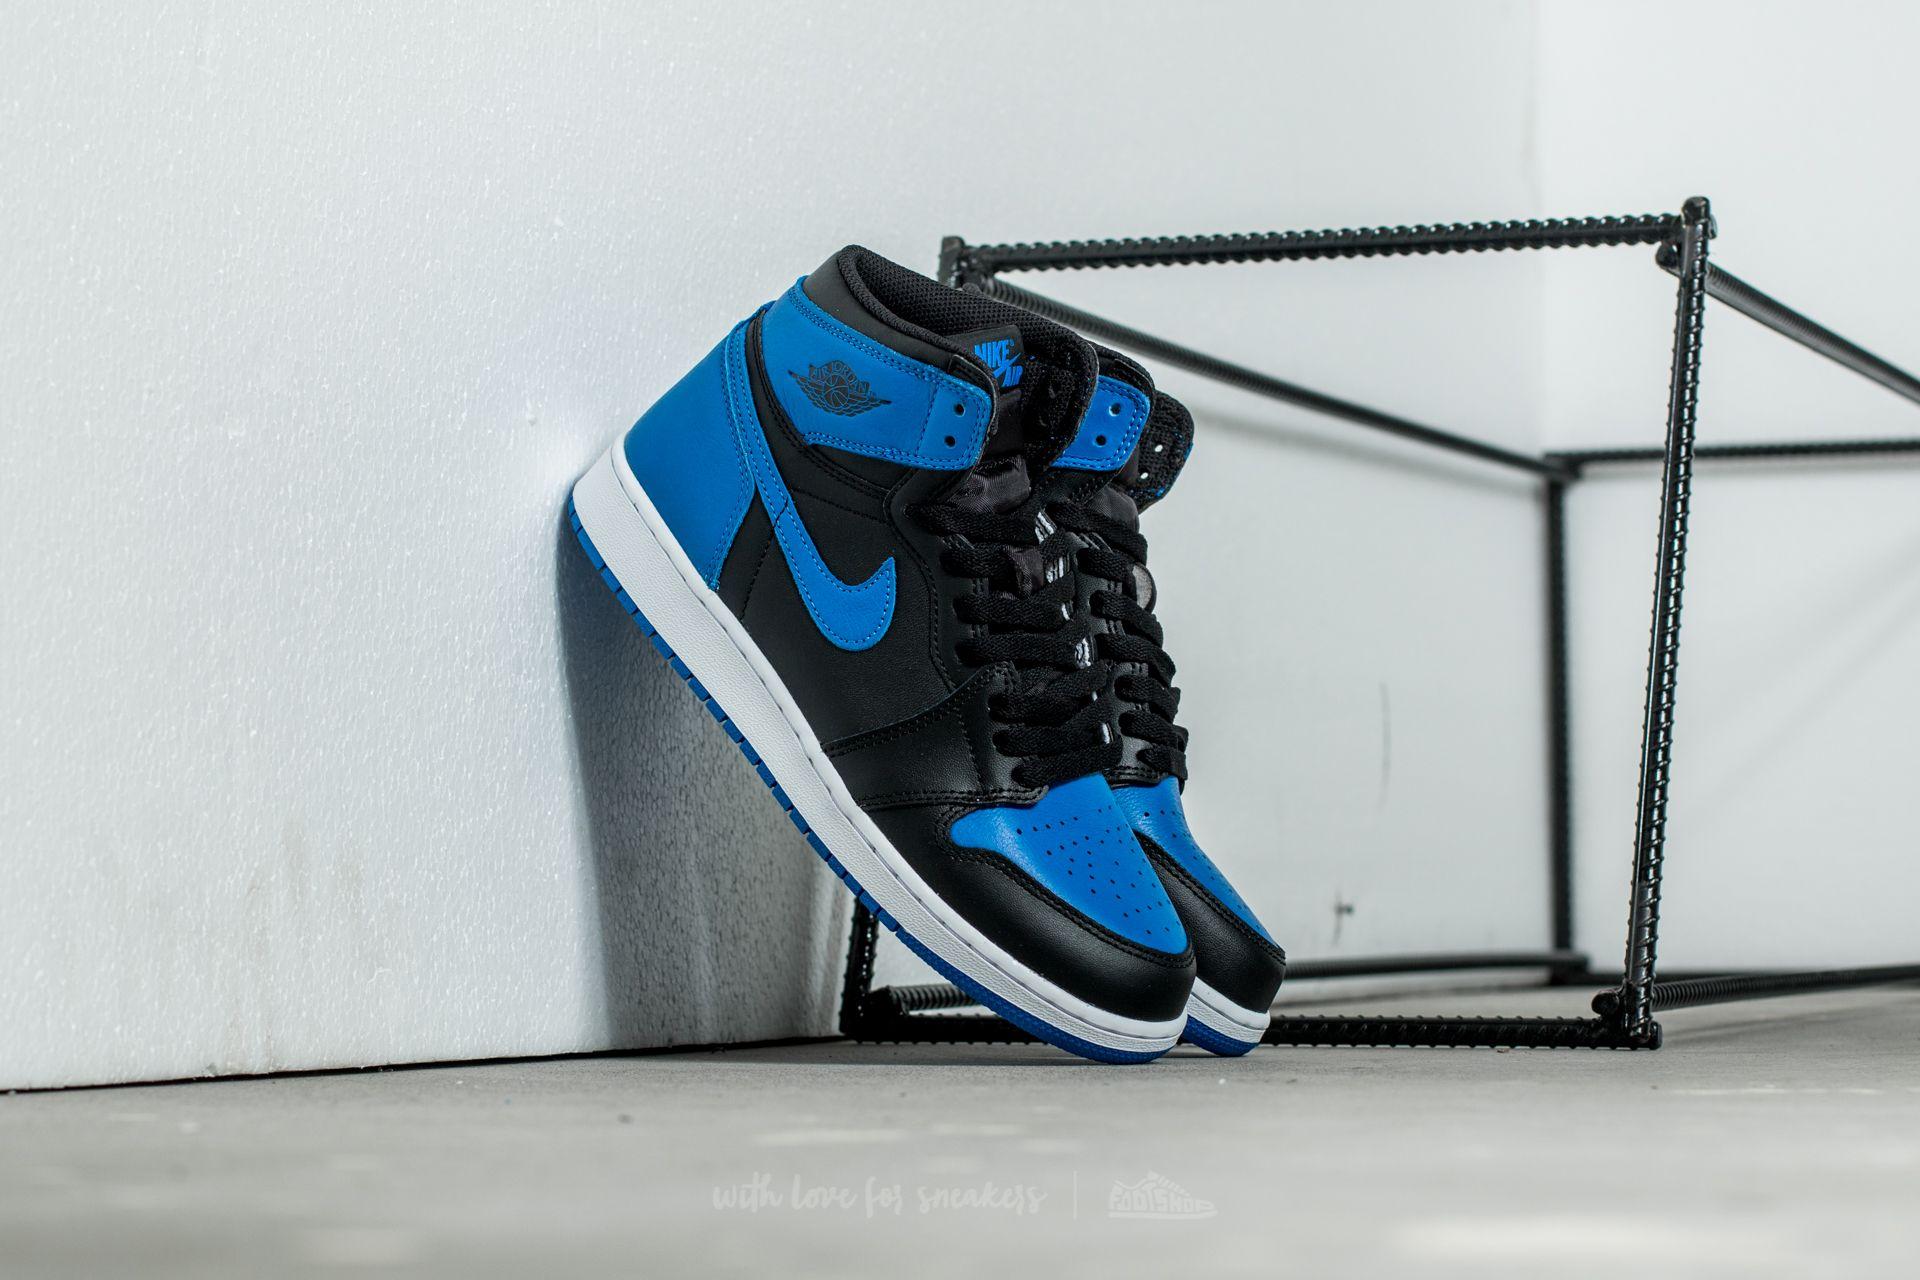 online retailer cbb74 12d4f Air Jordan 1 Retro High OG BG Black/ Royal-White | Footshop